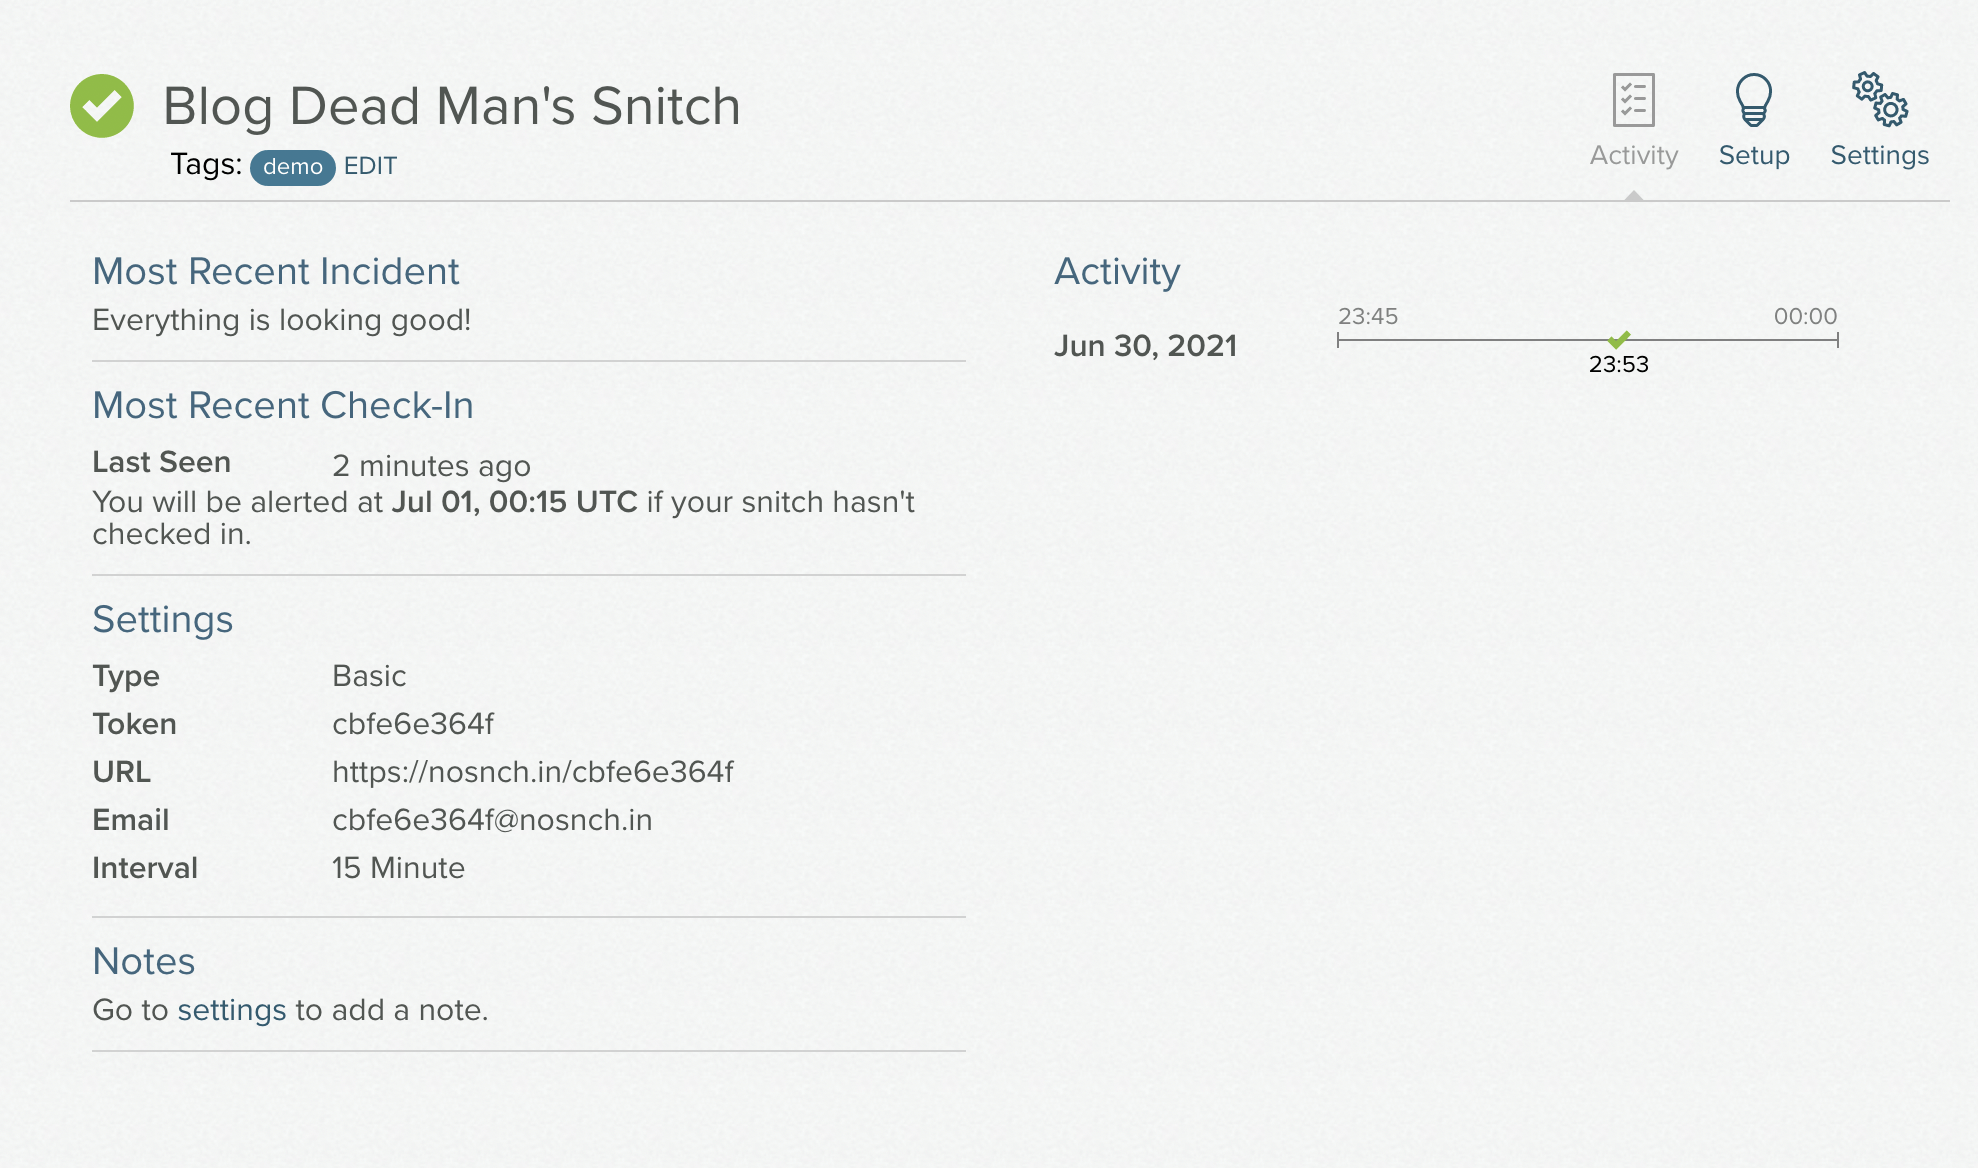 successful snitch activity